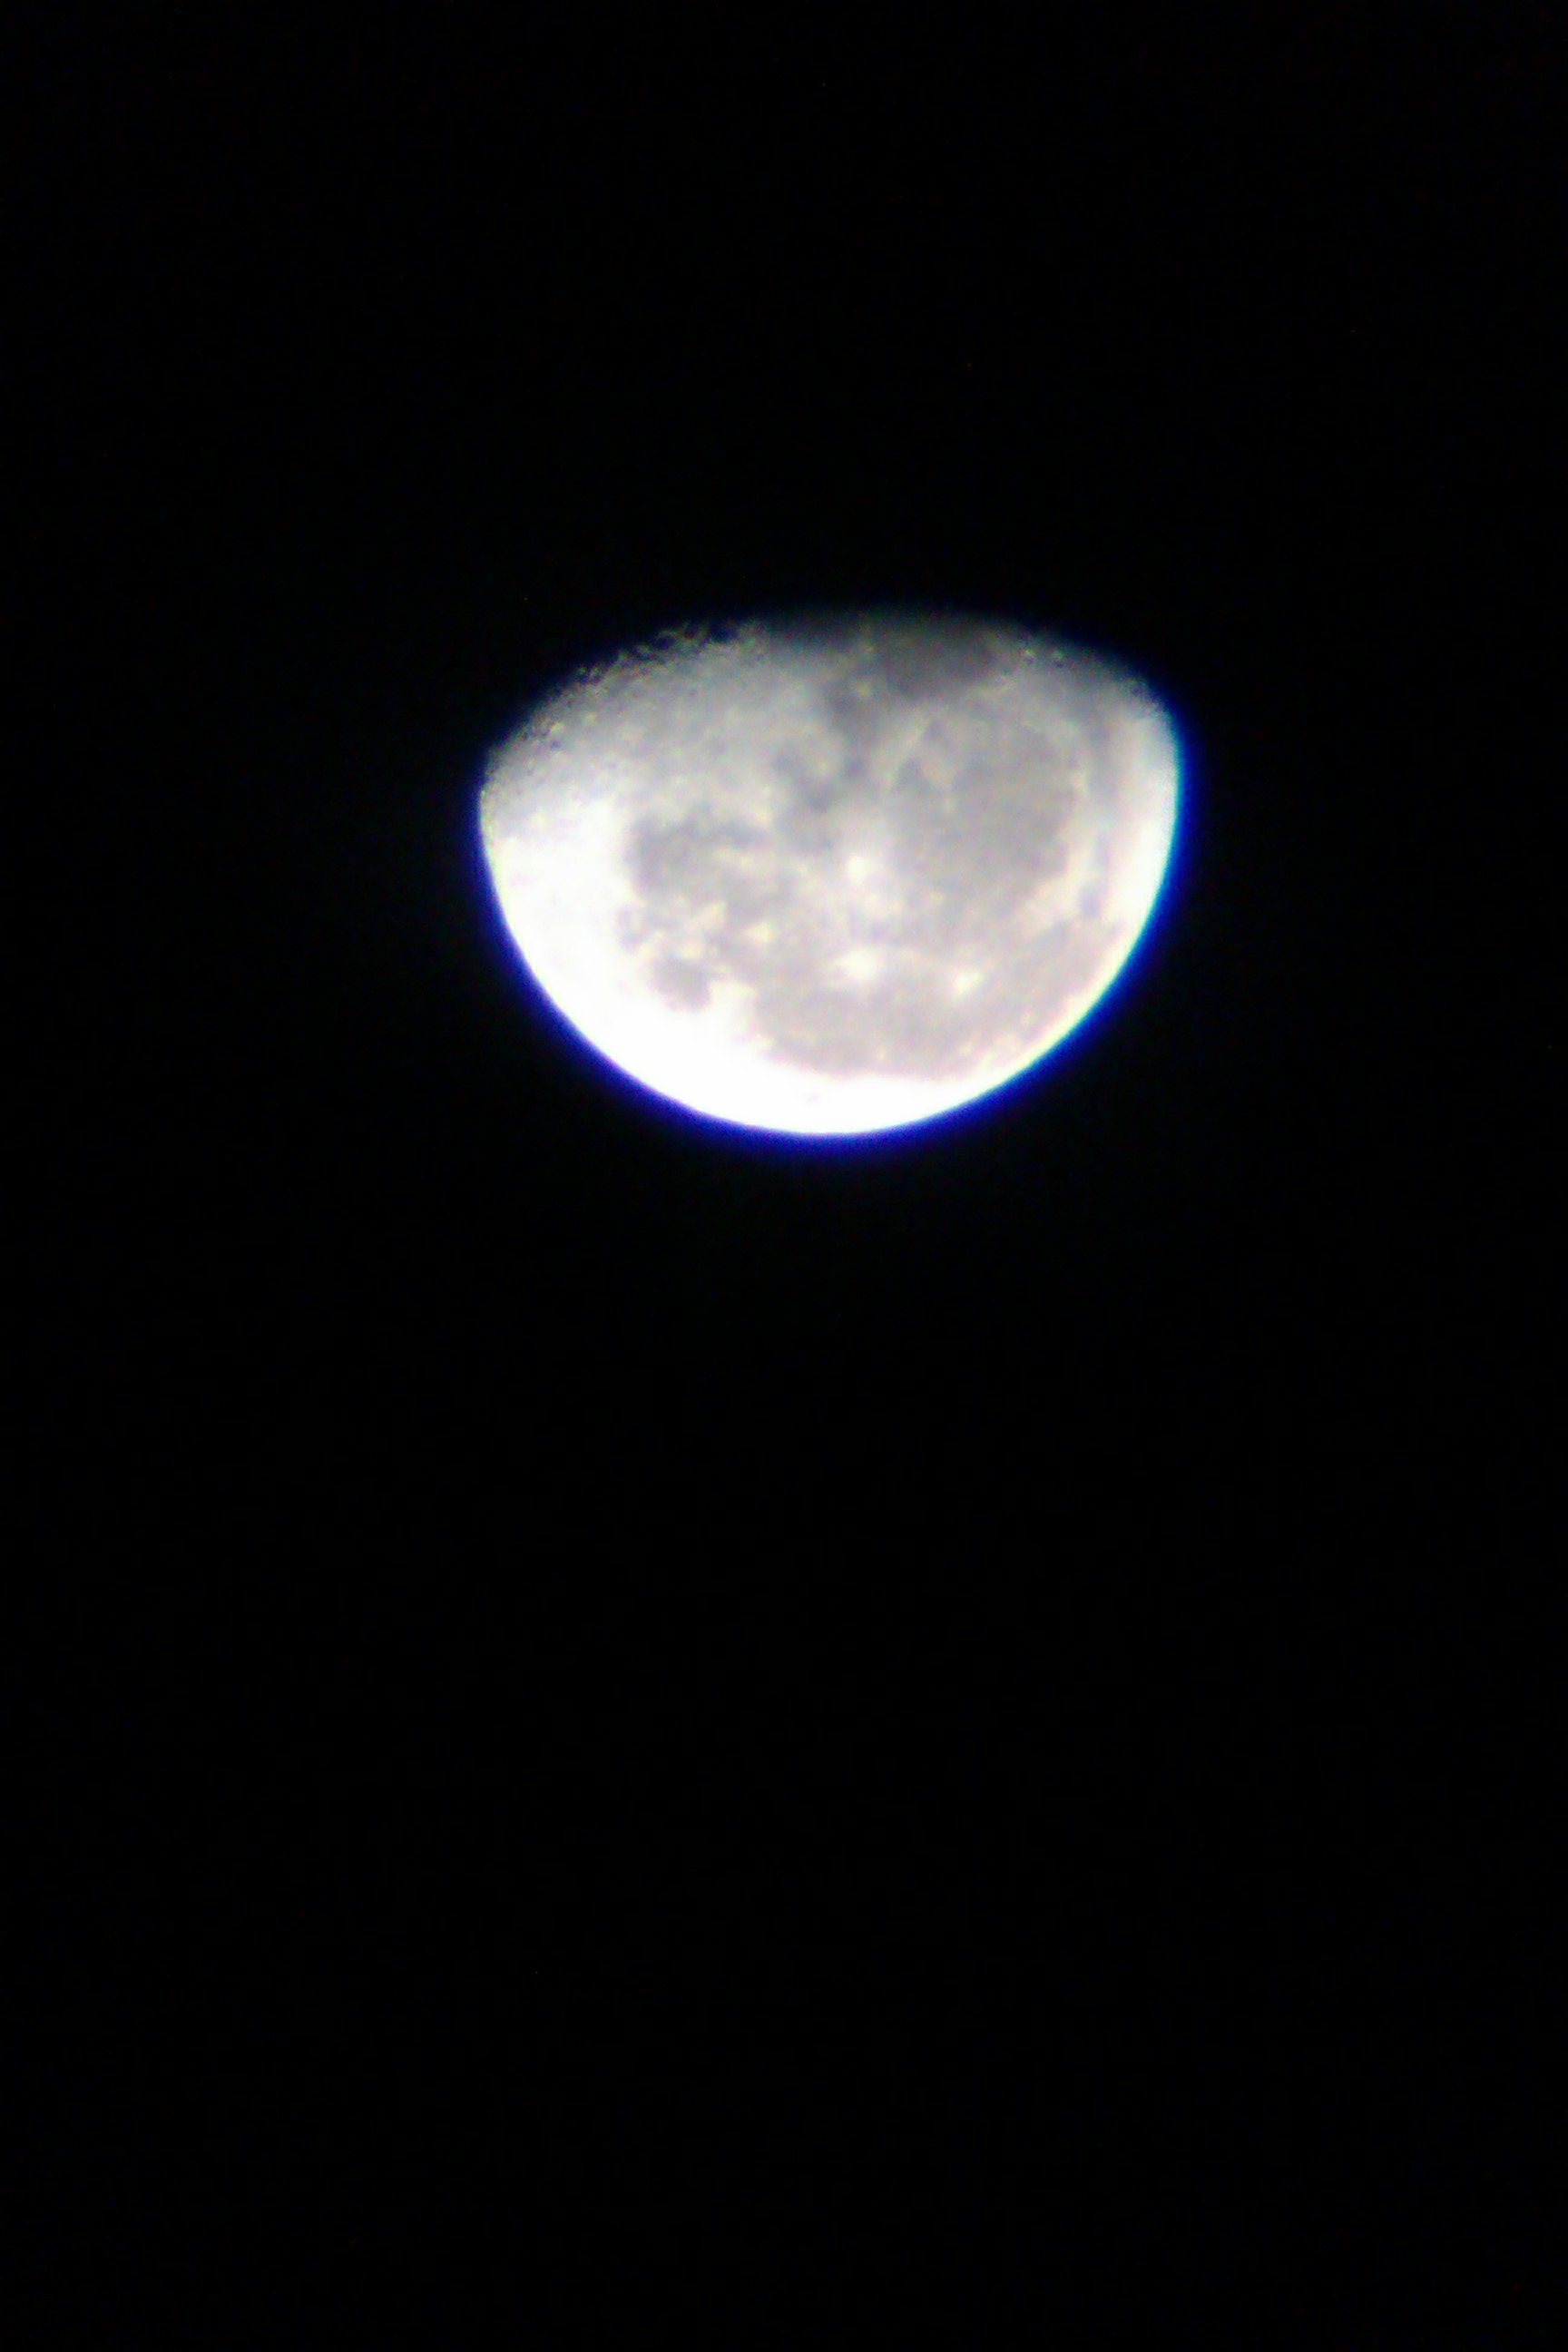 myblog.9e.cz/teleskop/M13.jpg